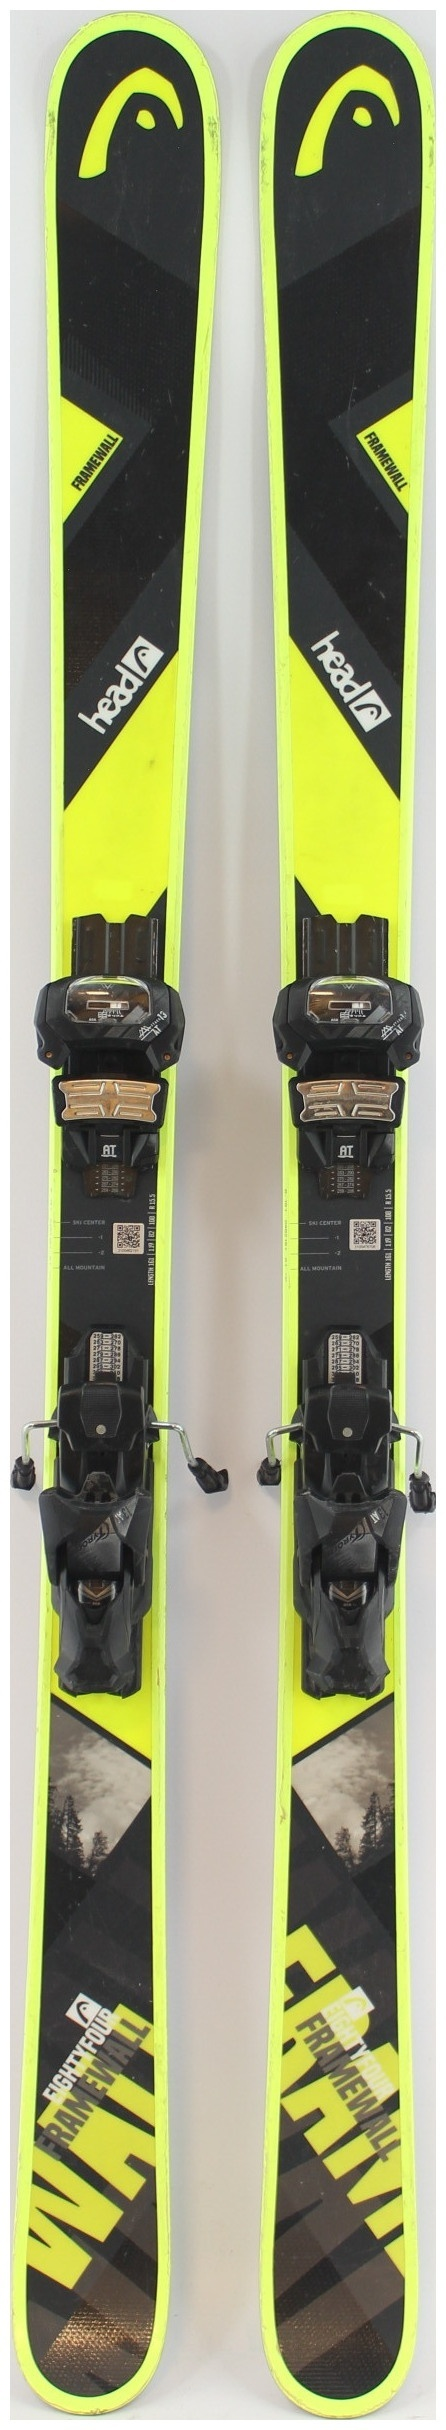 HEAD 2019 Frame Wall 171cm Skis